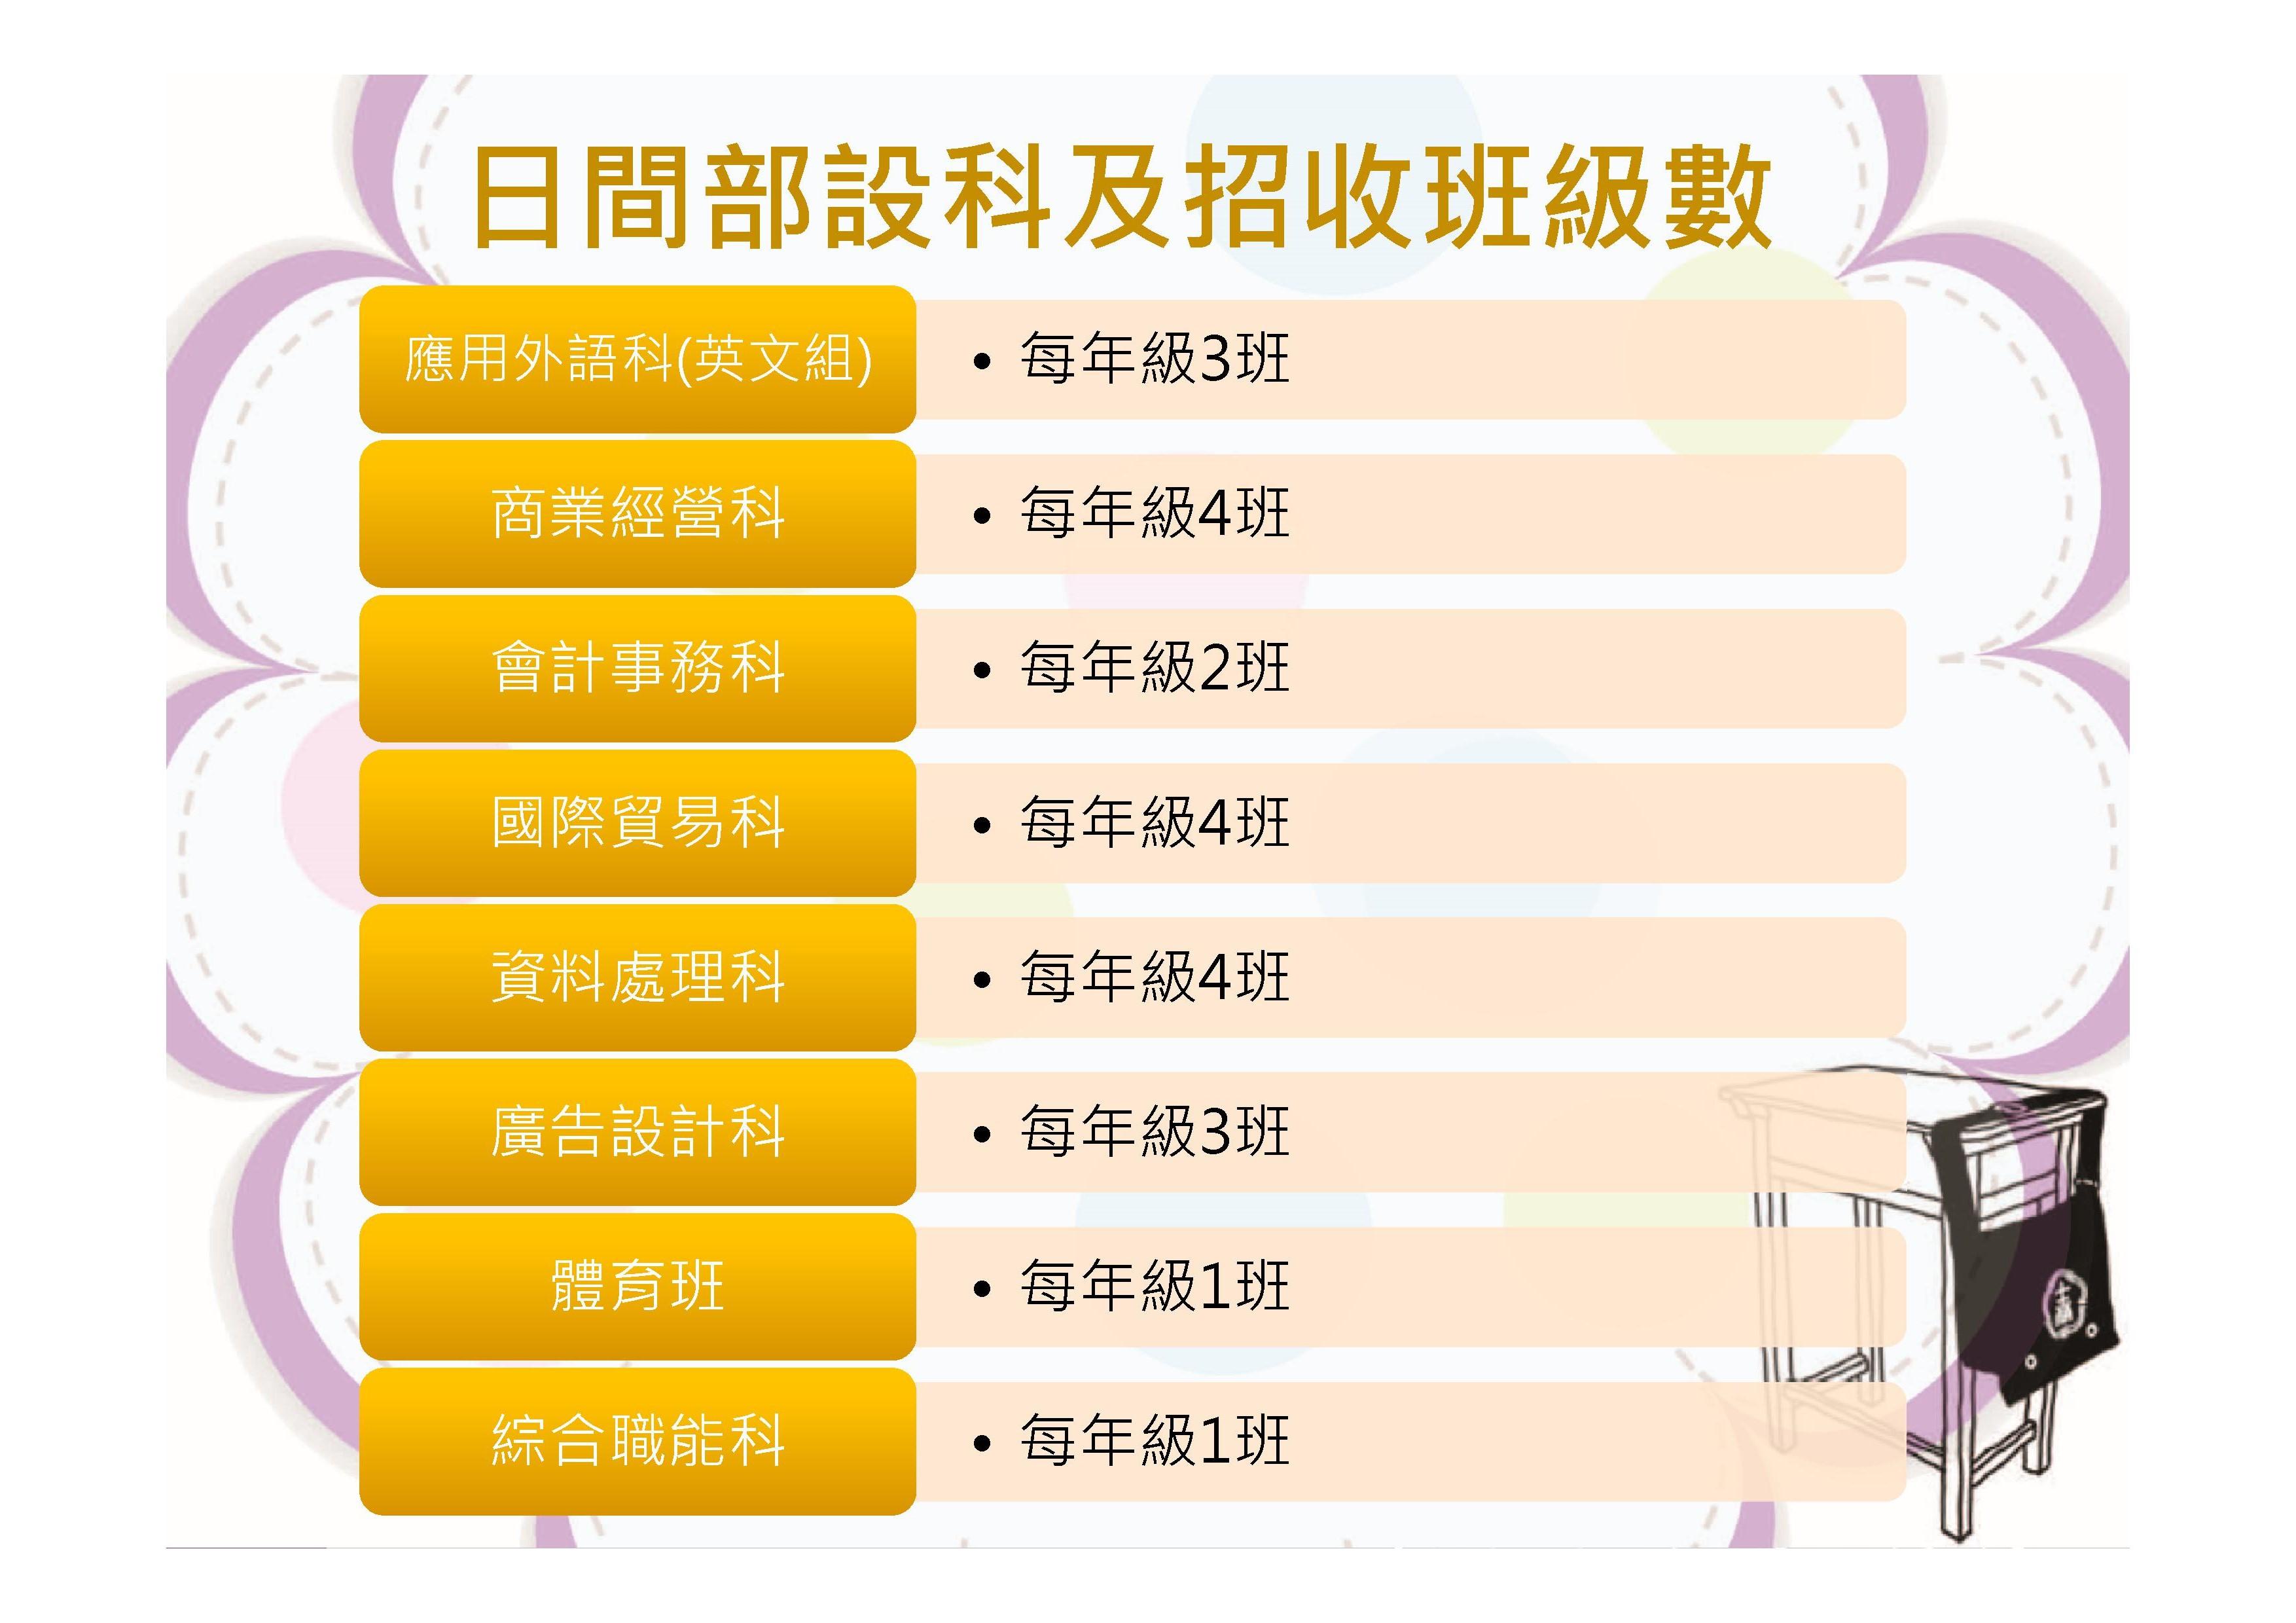 Microsoft PowerPoint - 技職教育暨士商簡介.pptx00011